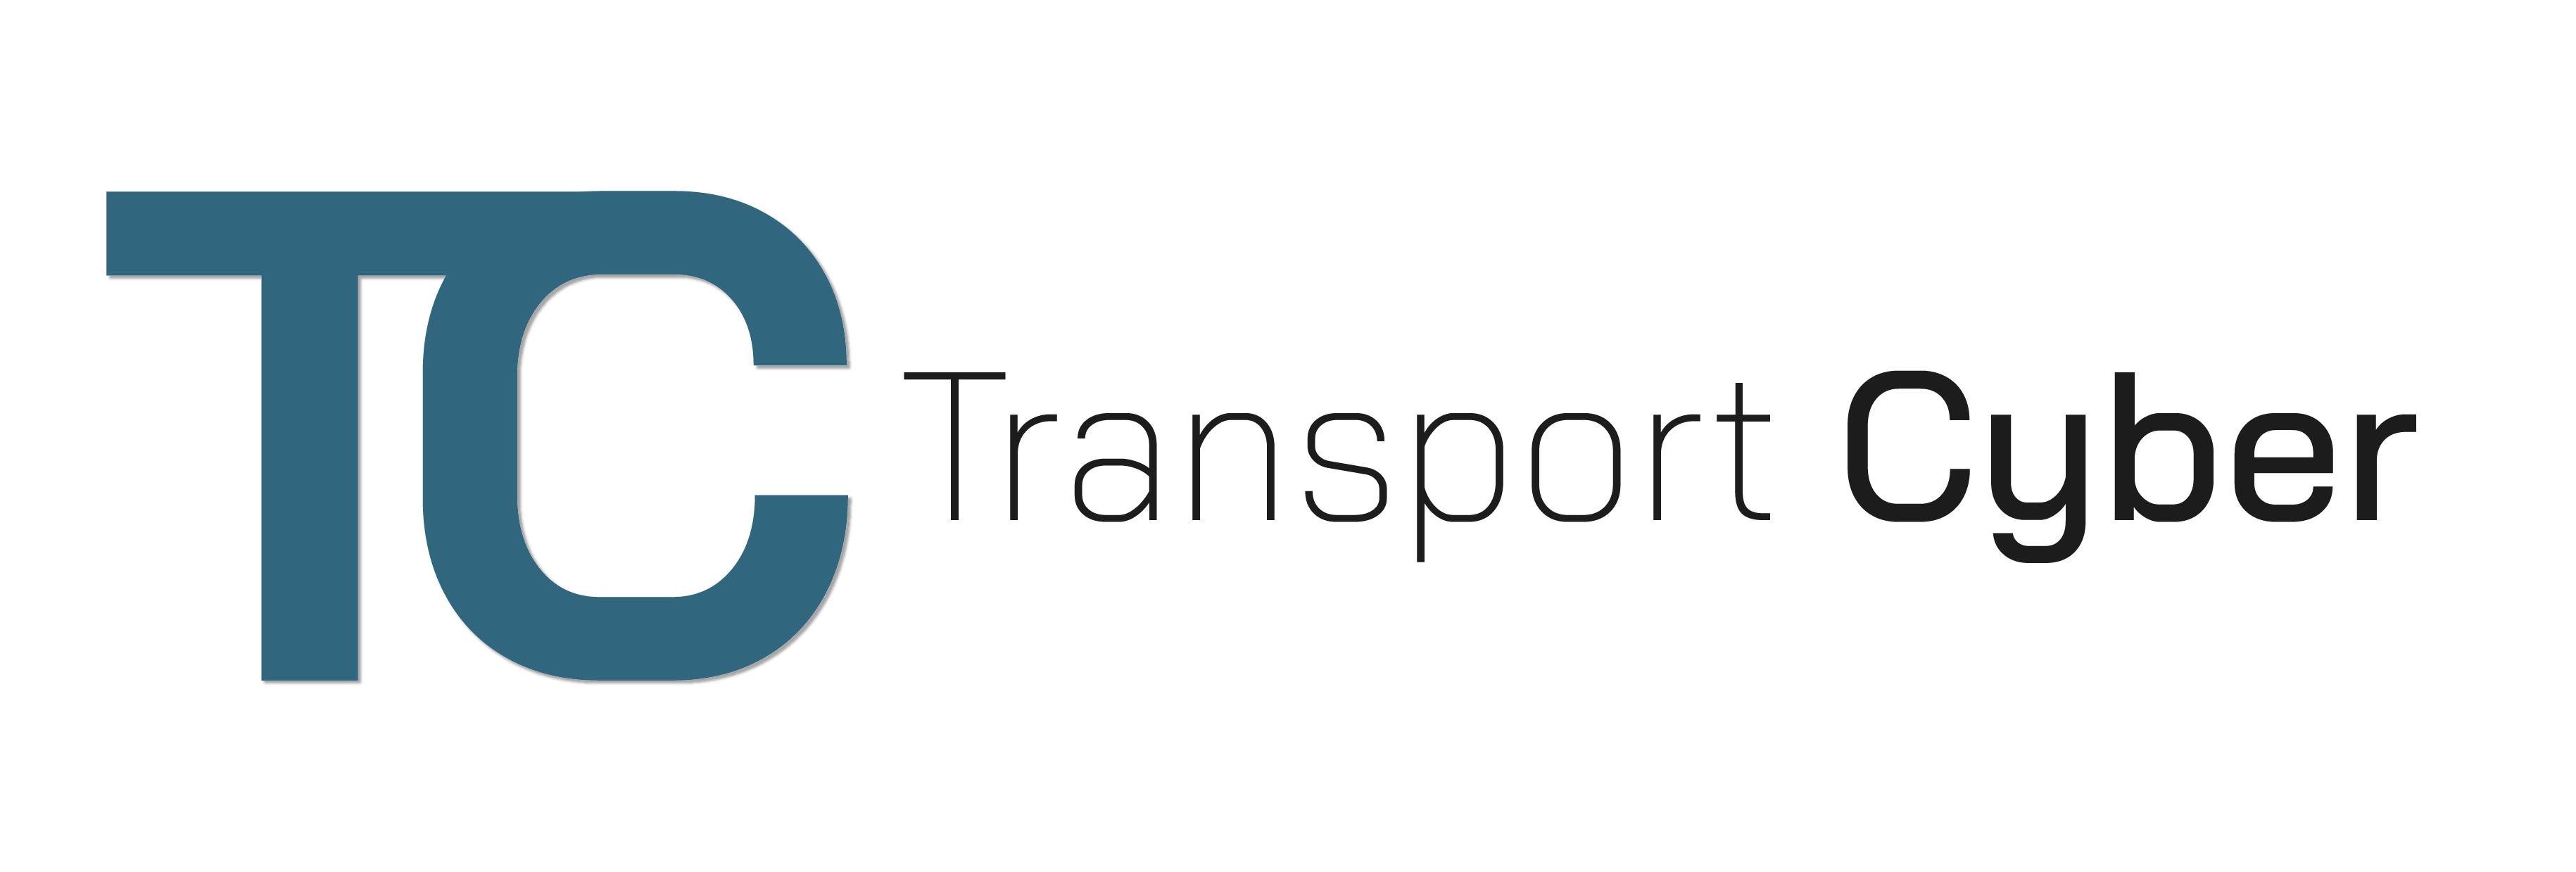 Transport Cyber